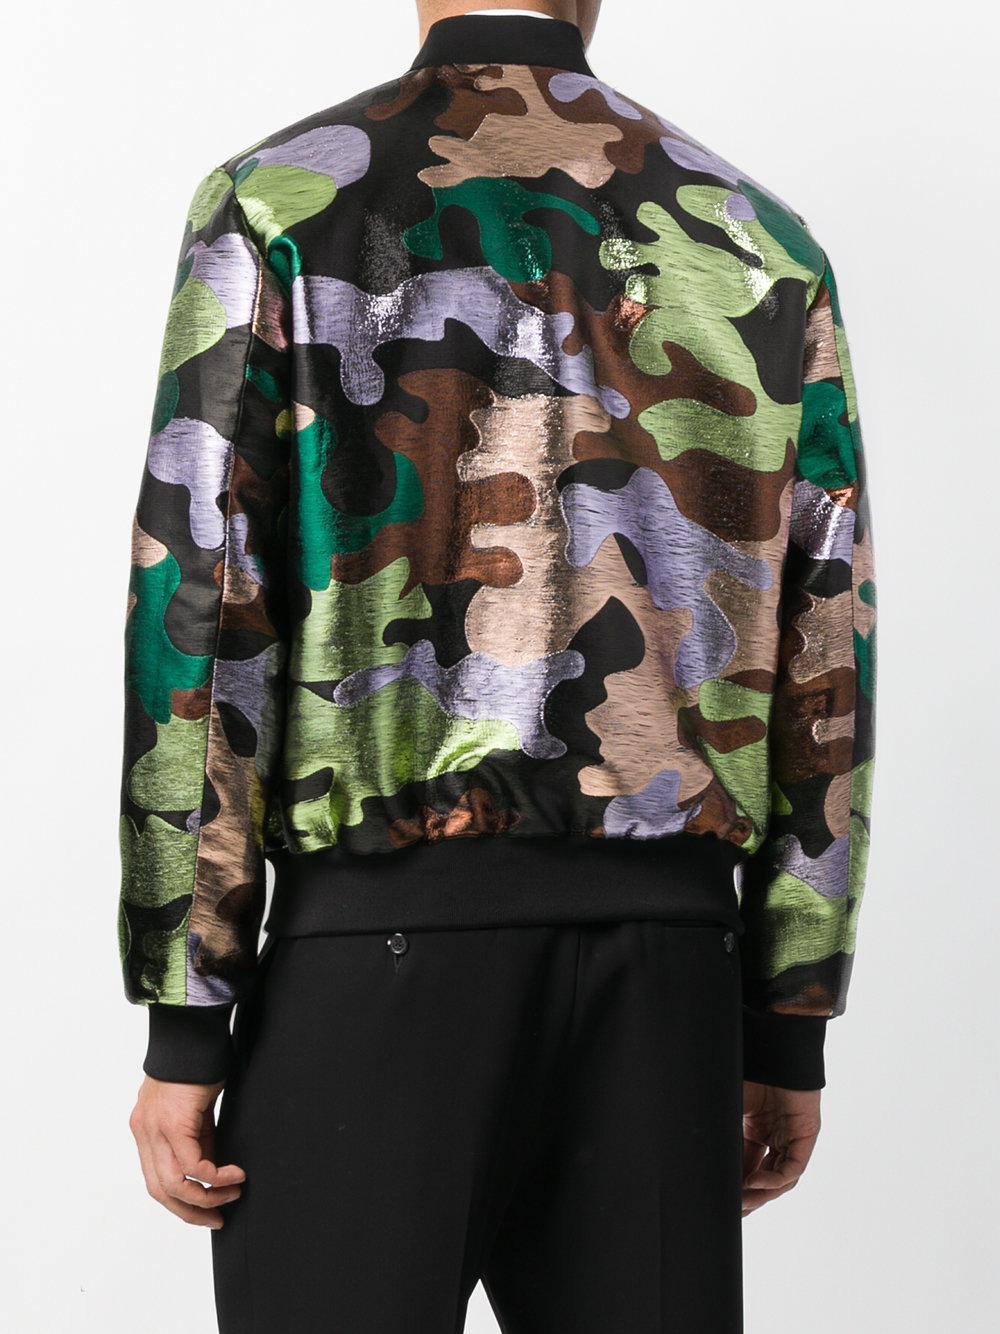 for Blazer Lyst Save Dsquared² Metallic Men Patterned Camouflage qOxxPSwFg